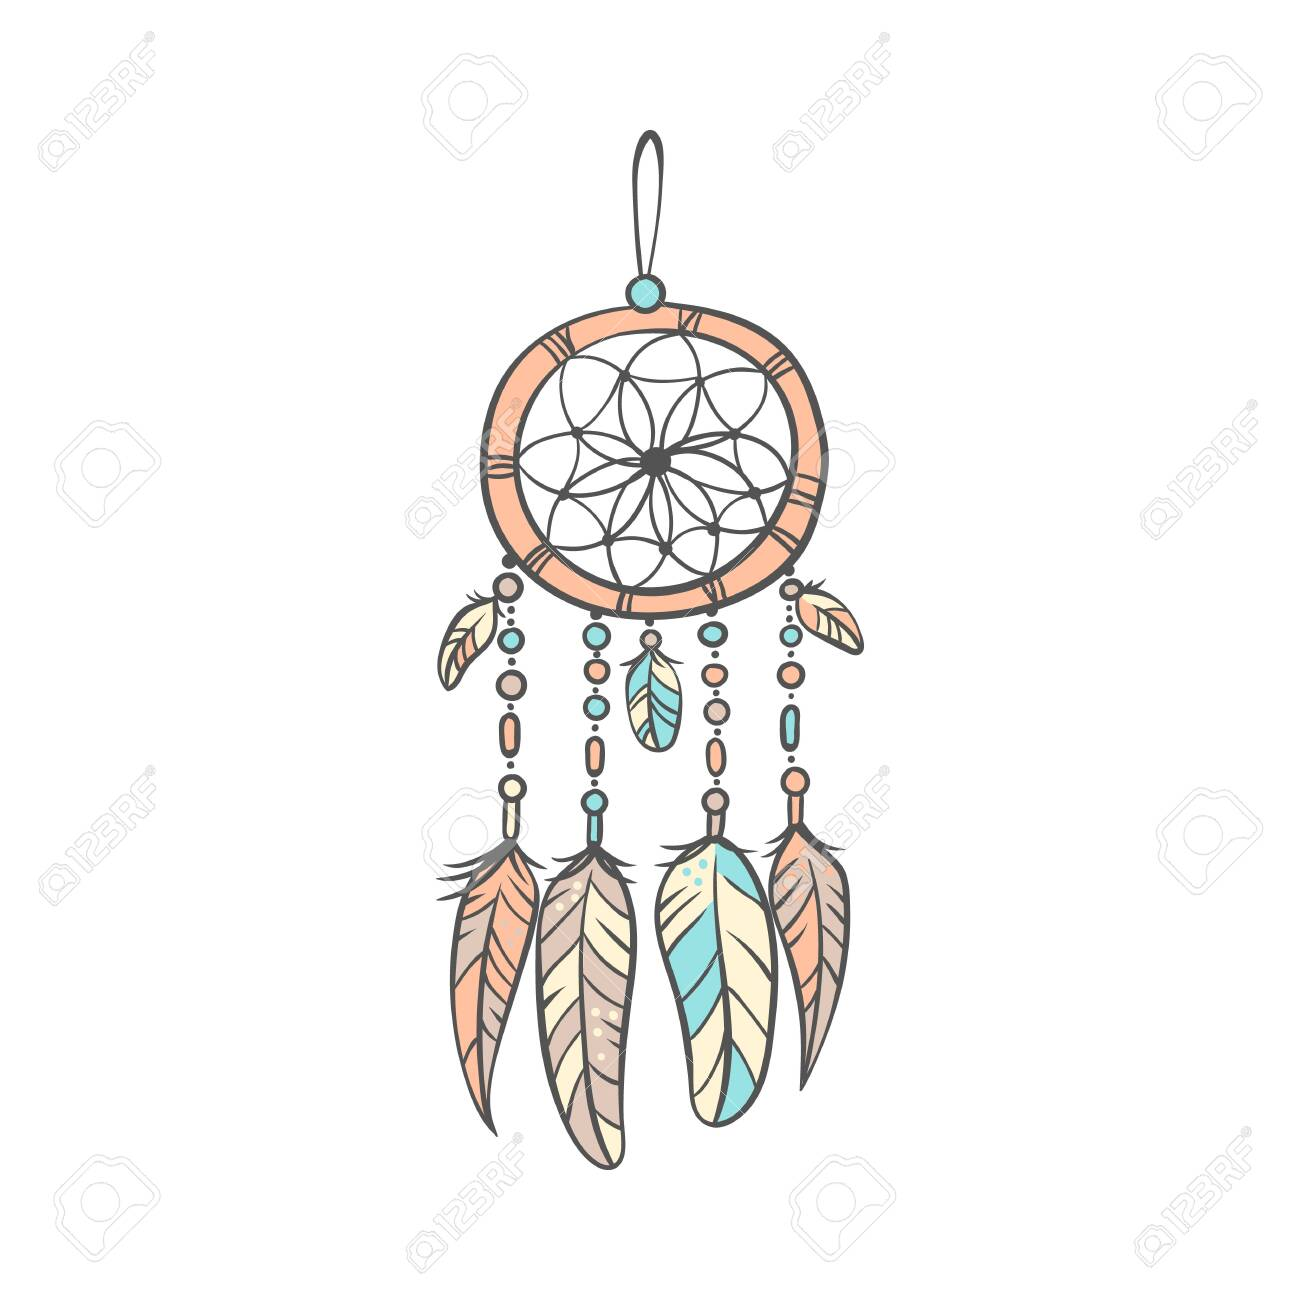 stylish decorative dream catcher